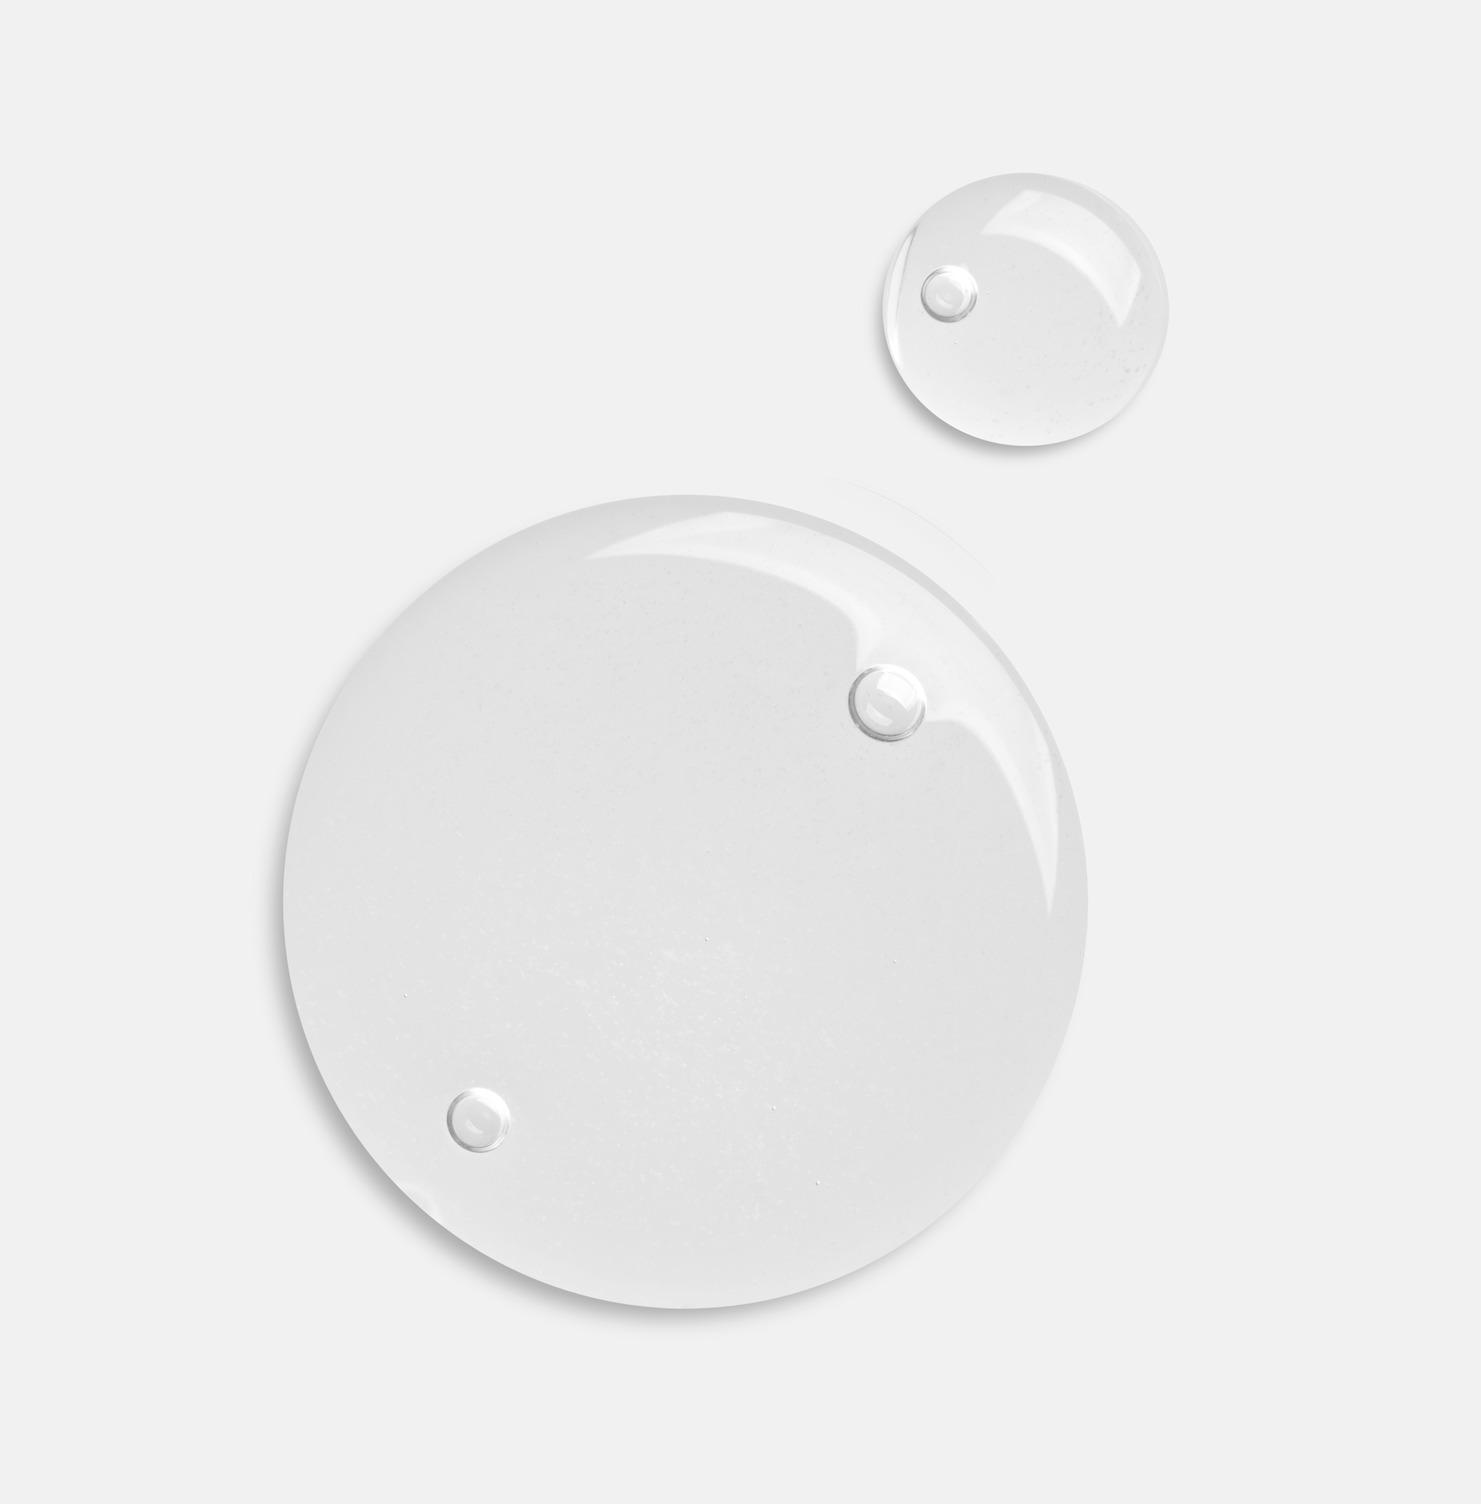 Lotion kiểm soát nhờn loại tẩy da chết  Paula's Choice Resist Advanced Pore - Refining Treatment 4% BHA 44ml Mã: 7791